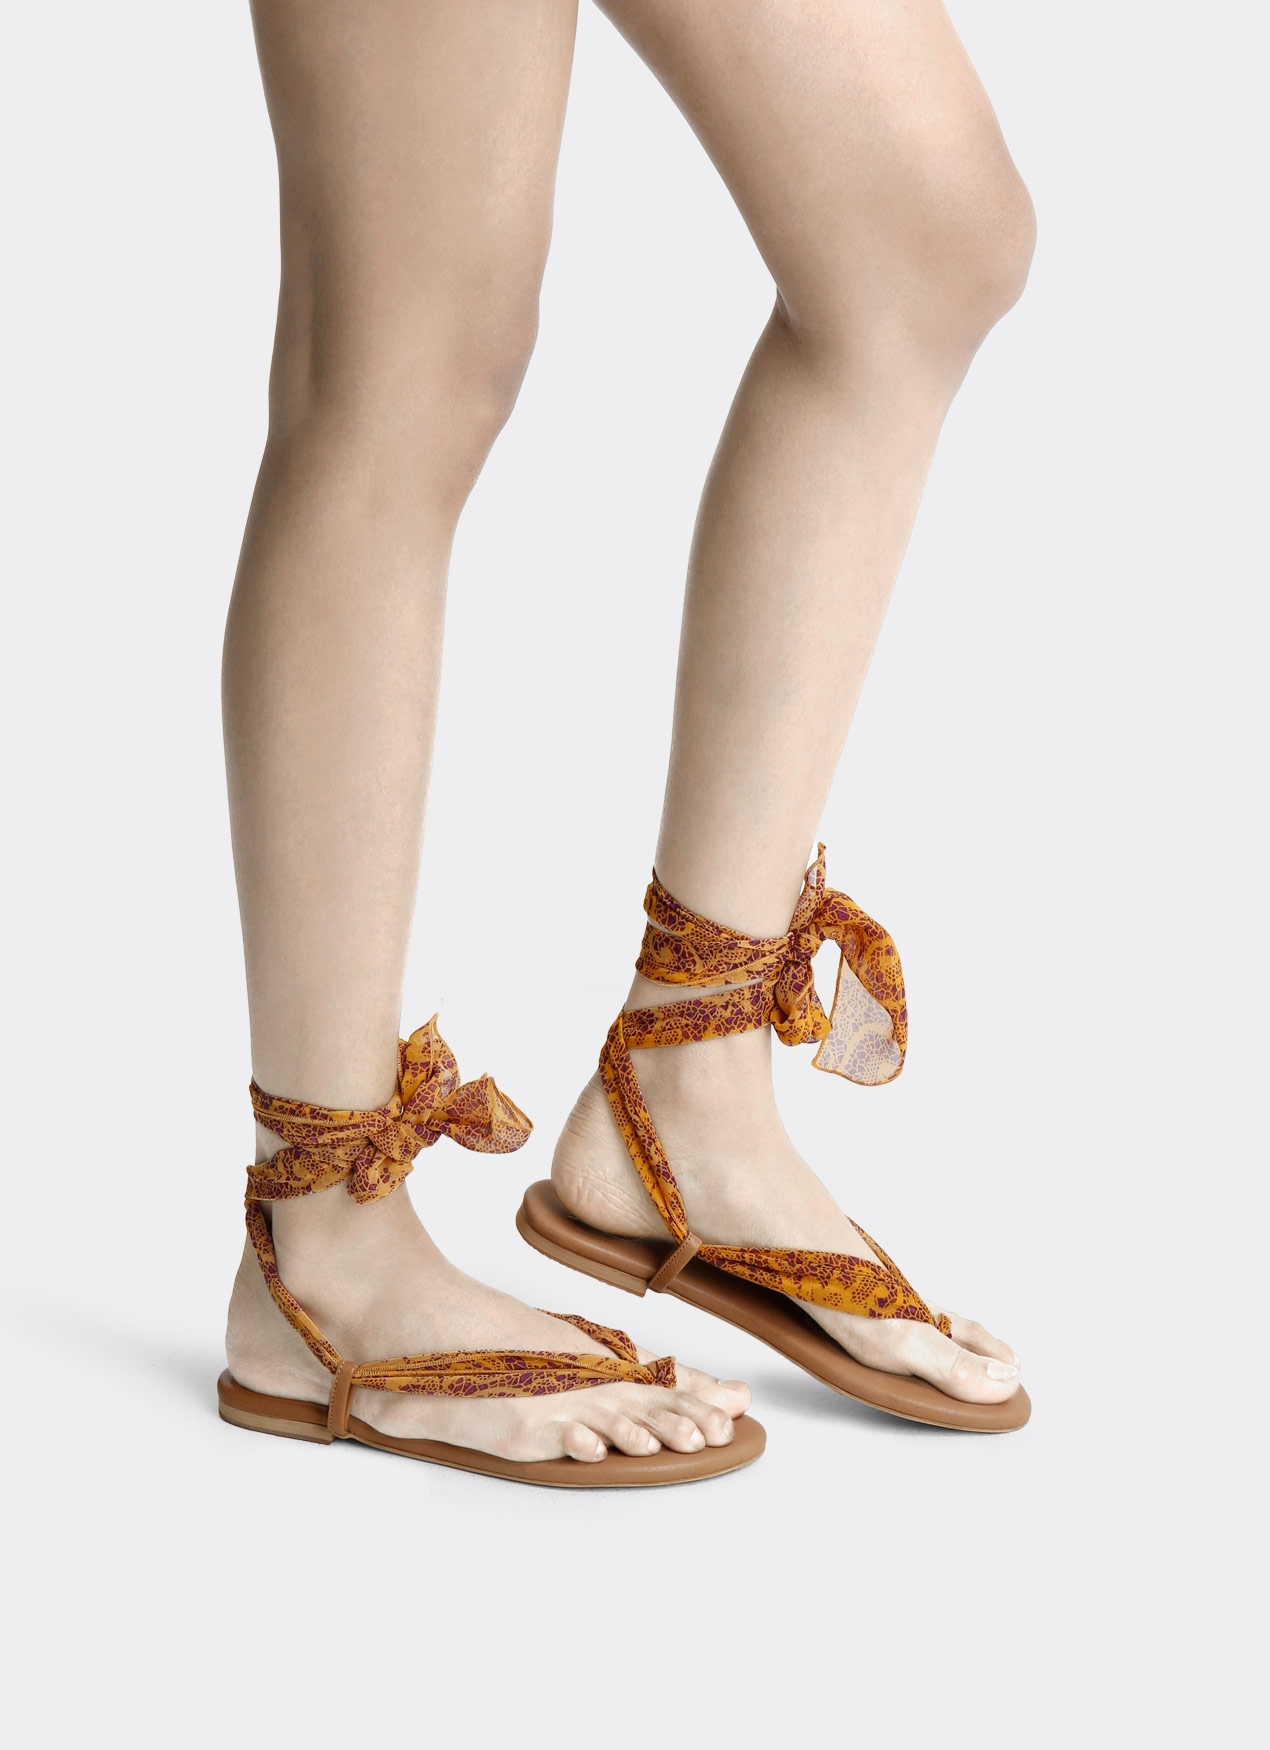 SOOKA STYLE Tie-a-knot Yellow Bloom Sandal Ribbon